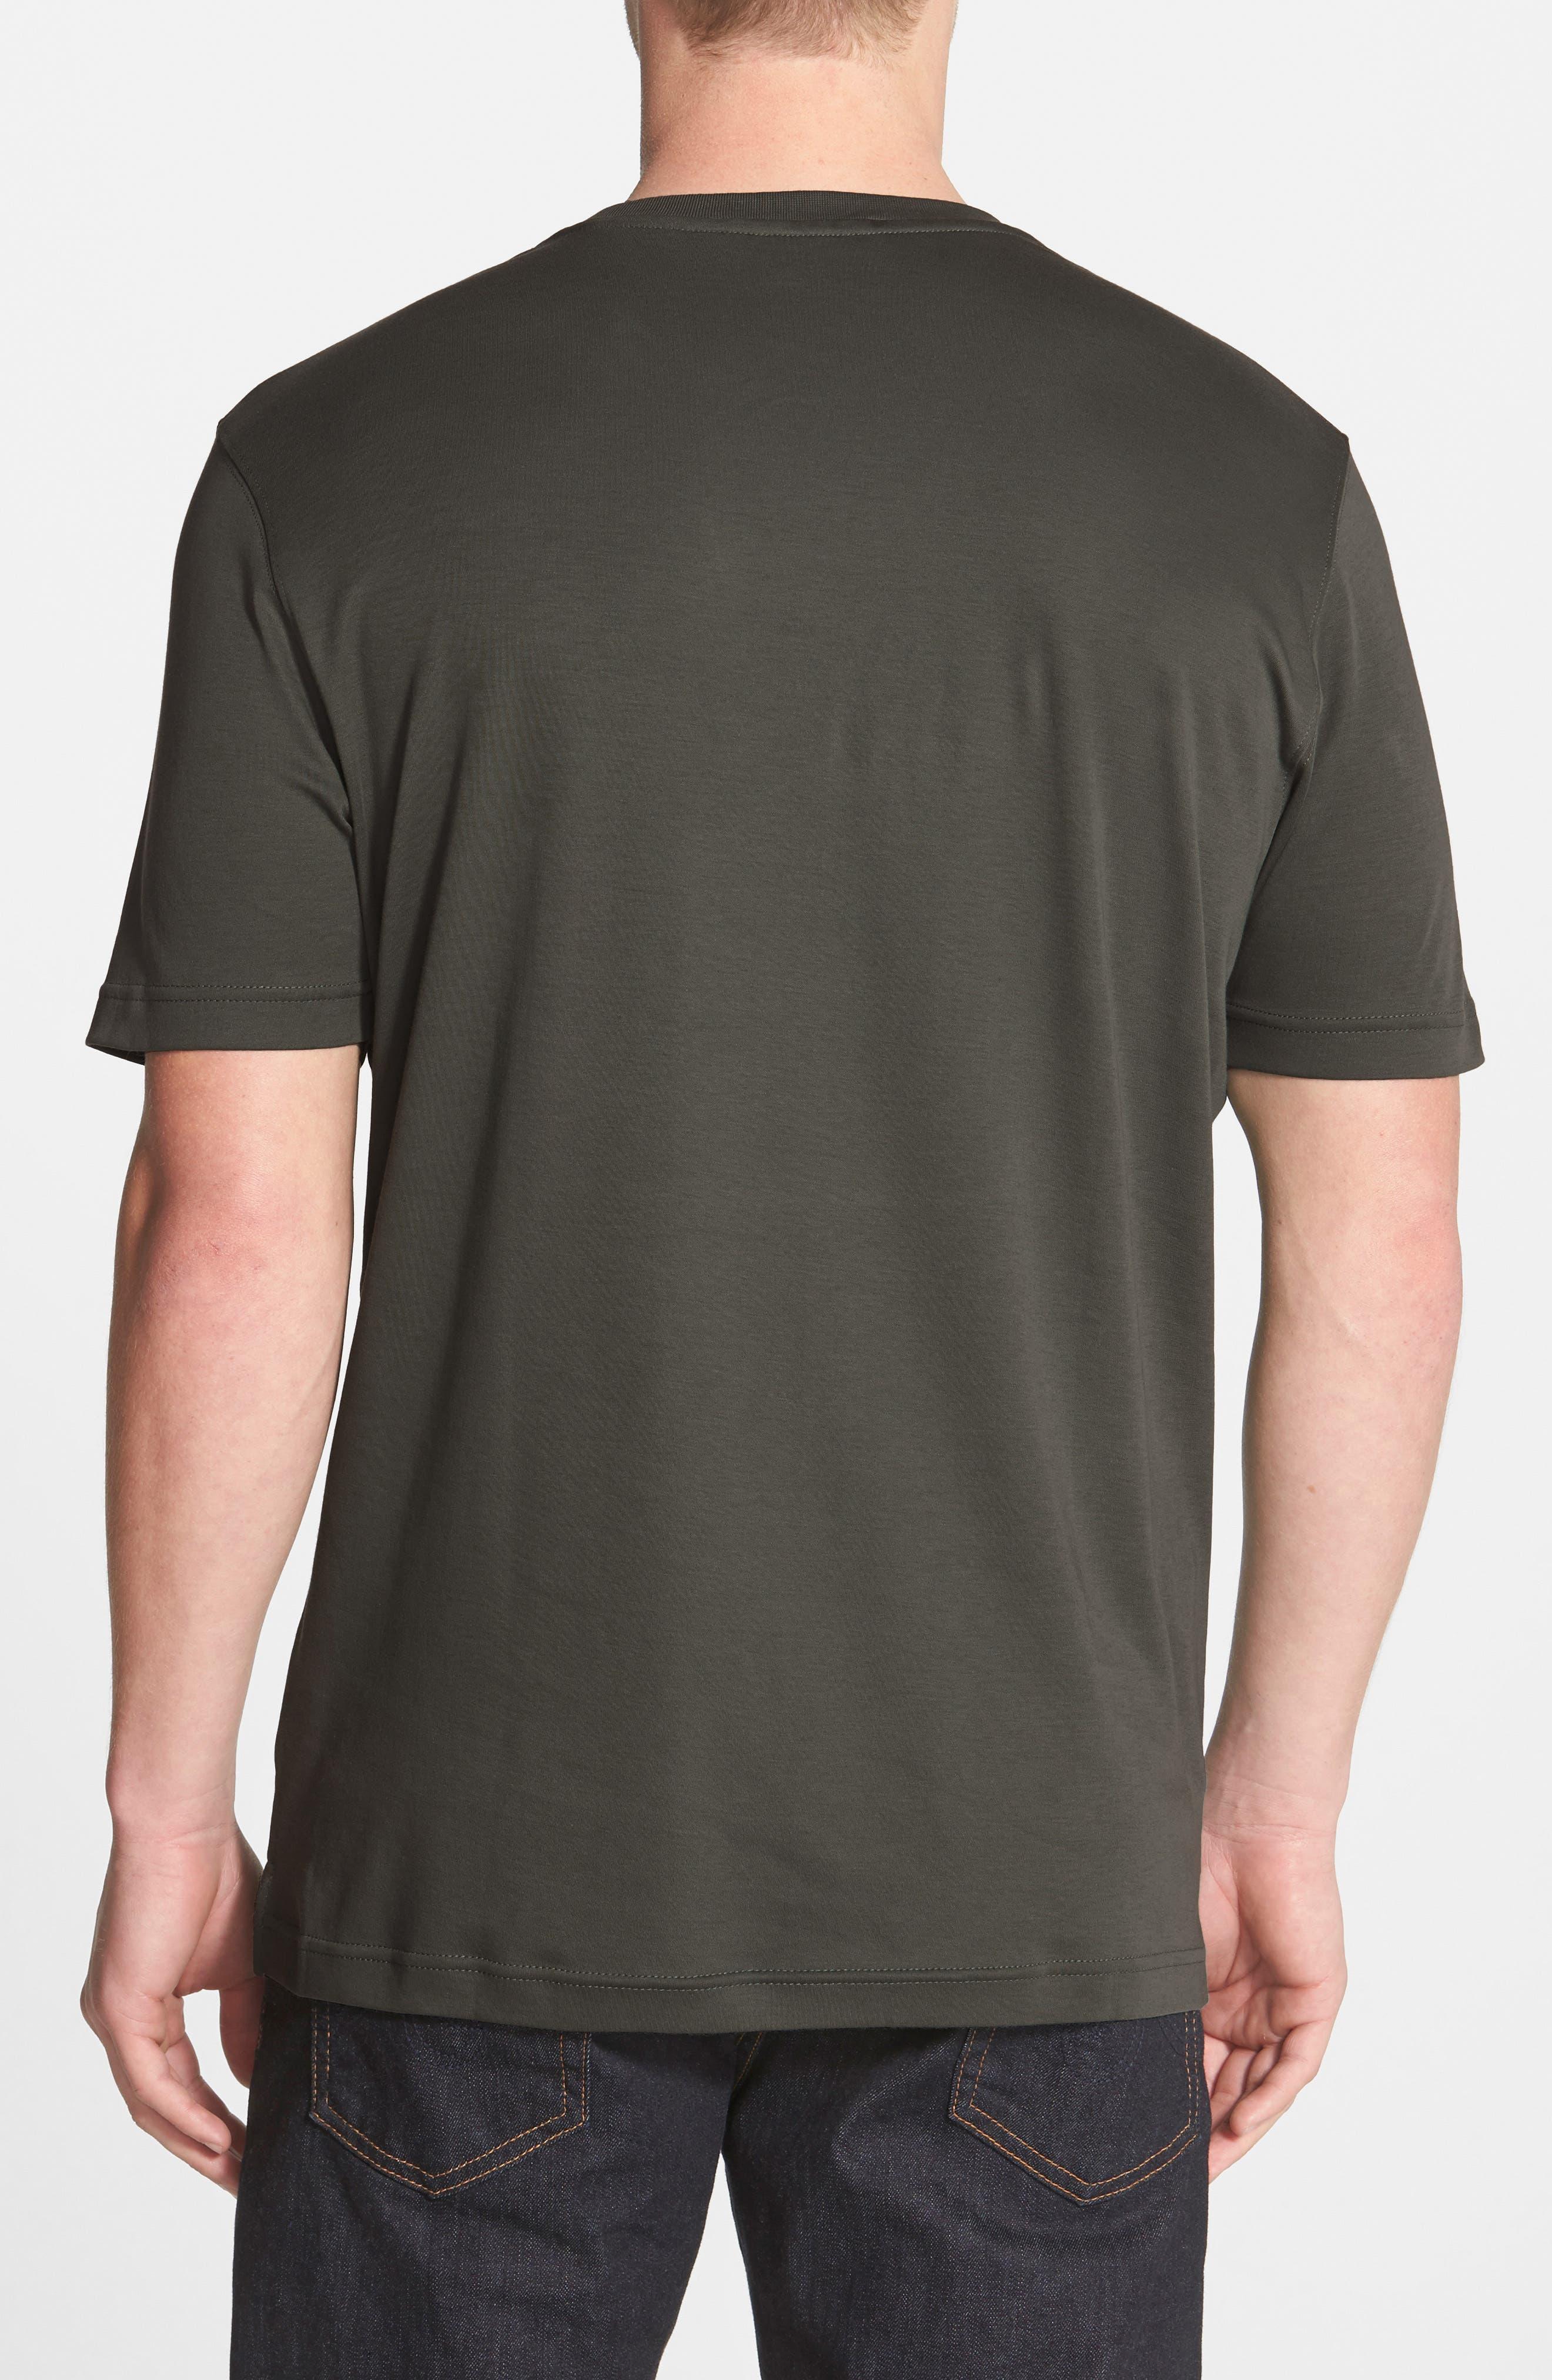 2bffb45f90846 Men's Clothing   Nordstrom